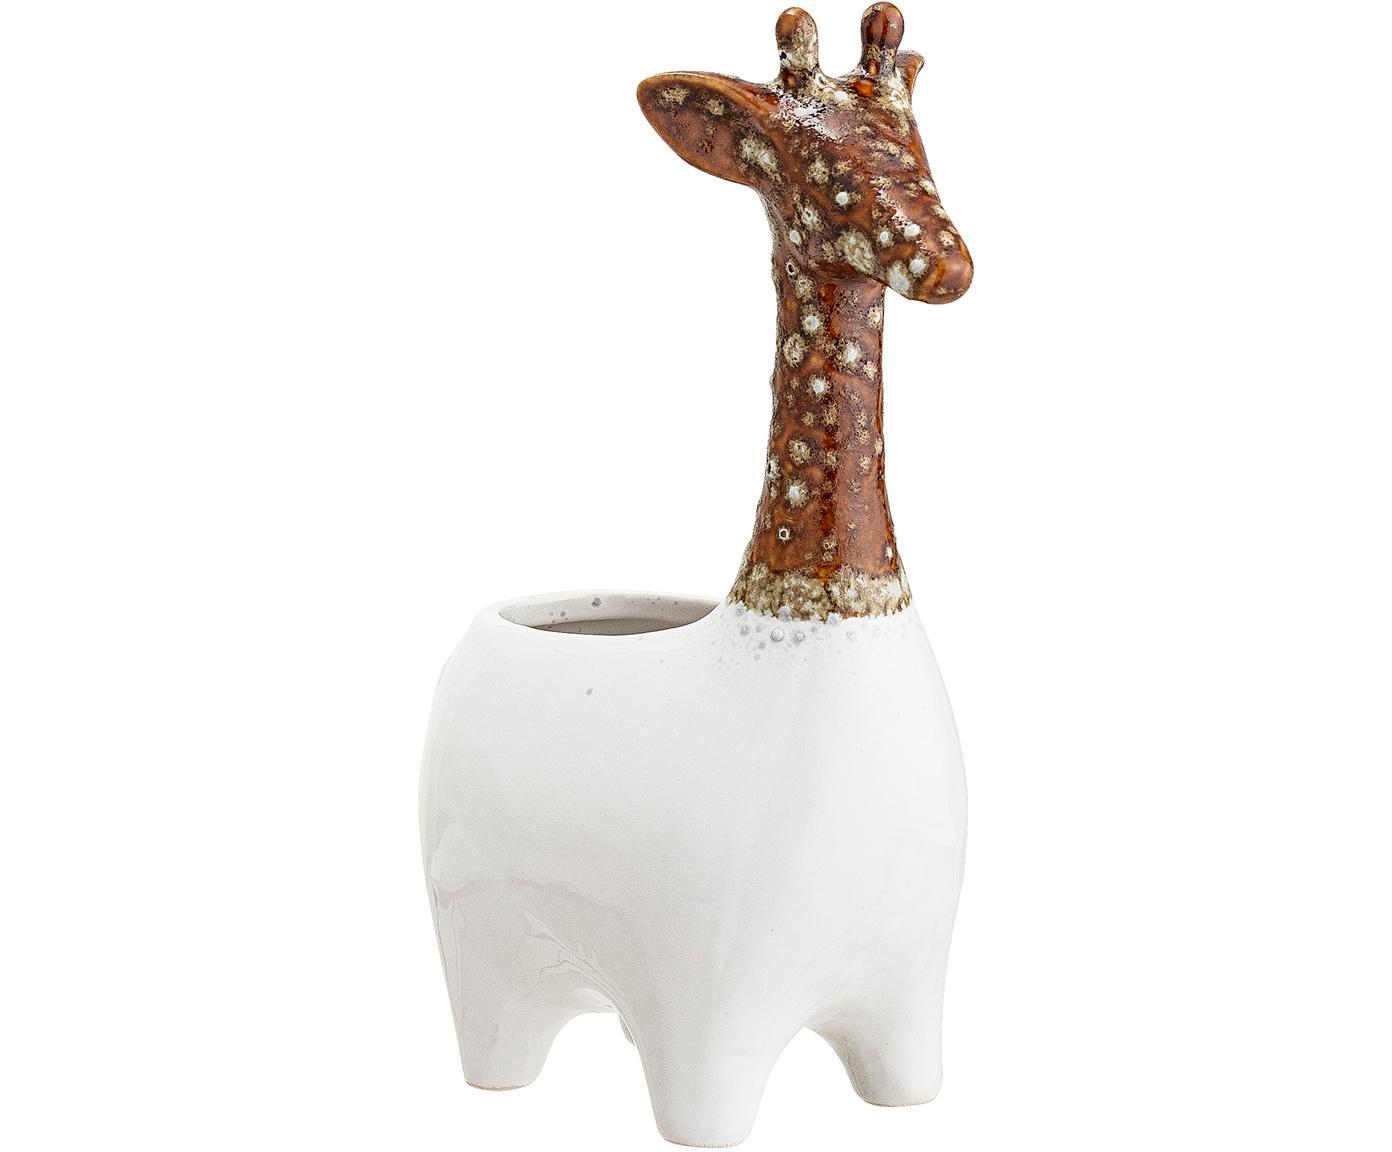 Macetero artesanal Giraffe, Gres, Blanco, fresno, An 17 x Al 25 cm